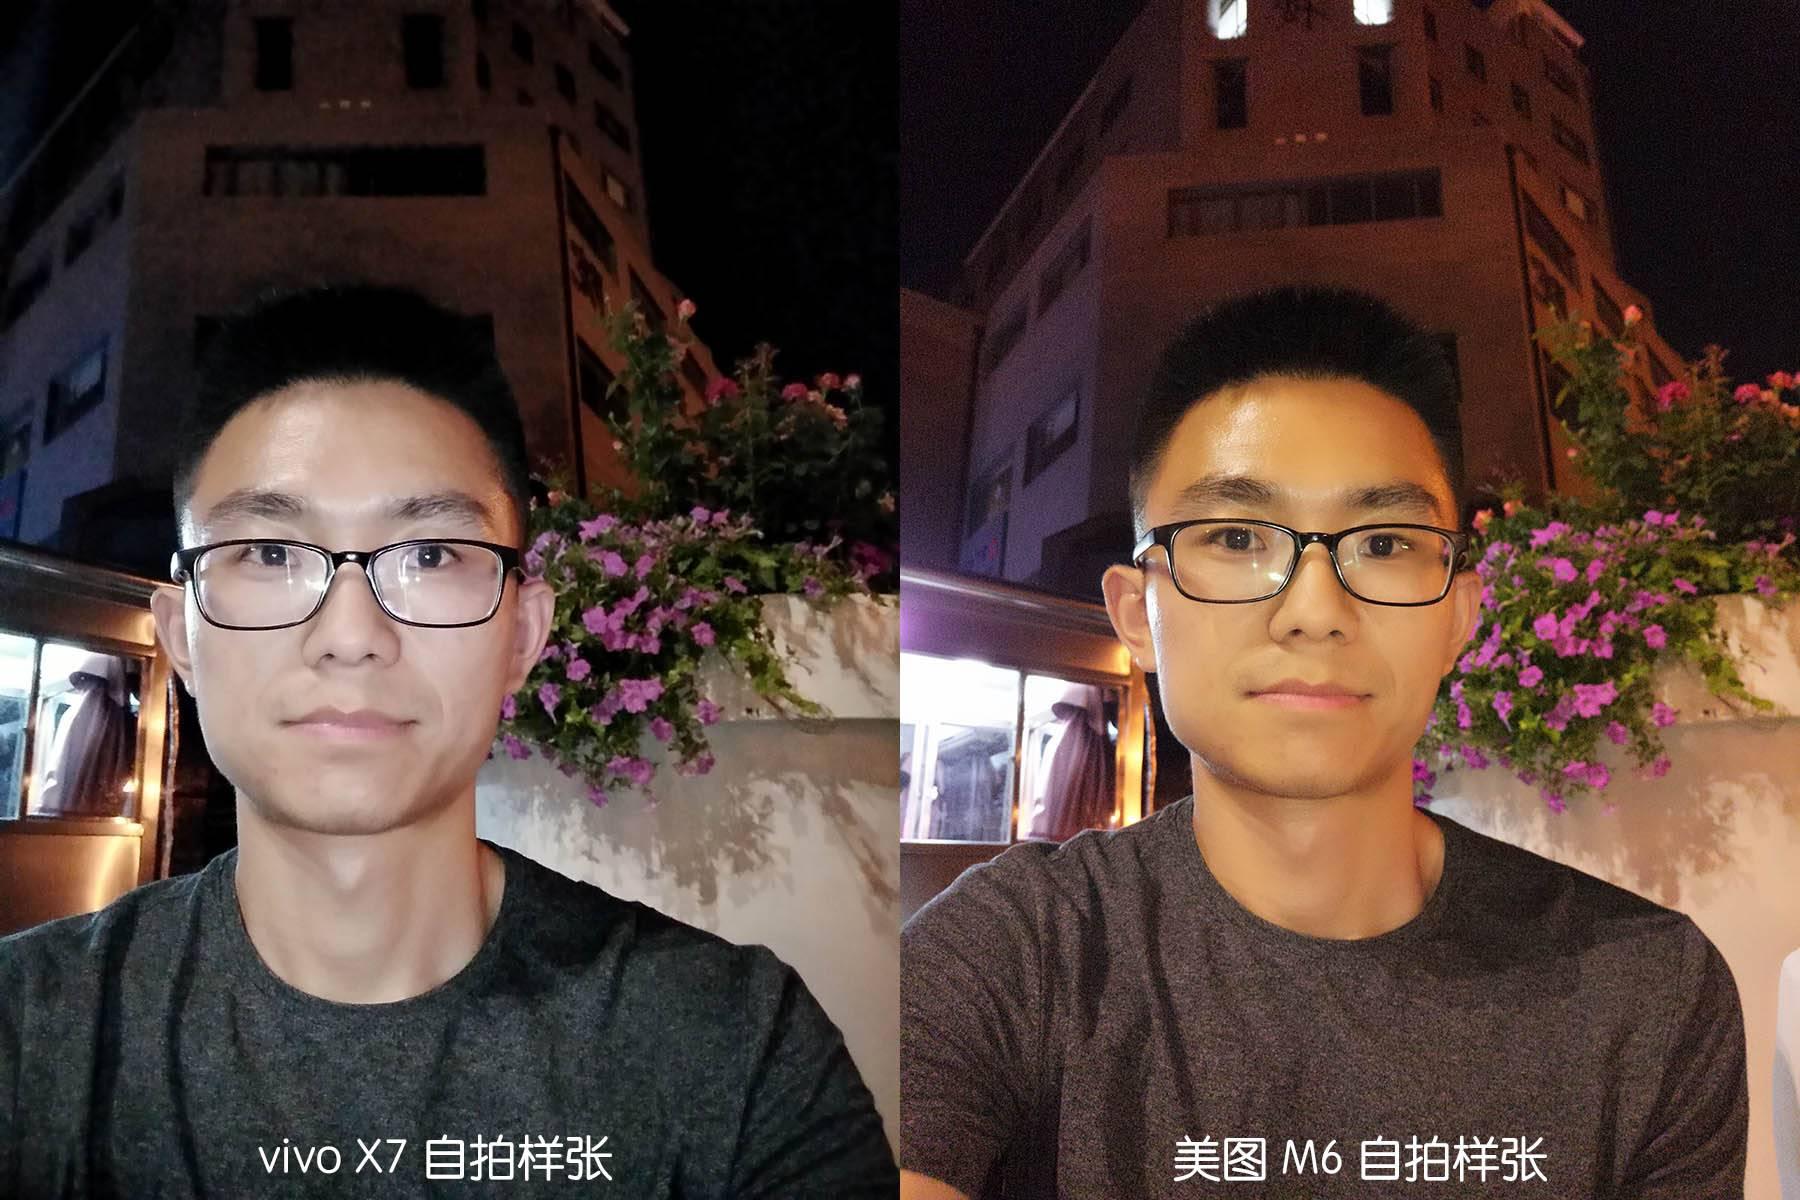 vivo X7、美图 M6 自拍样张对比。注:M6 前置摄像头像素是 2100 万。